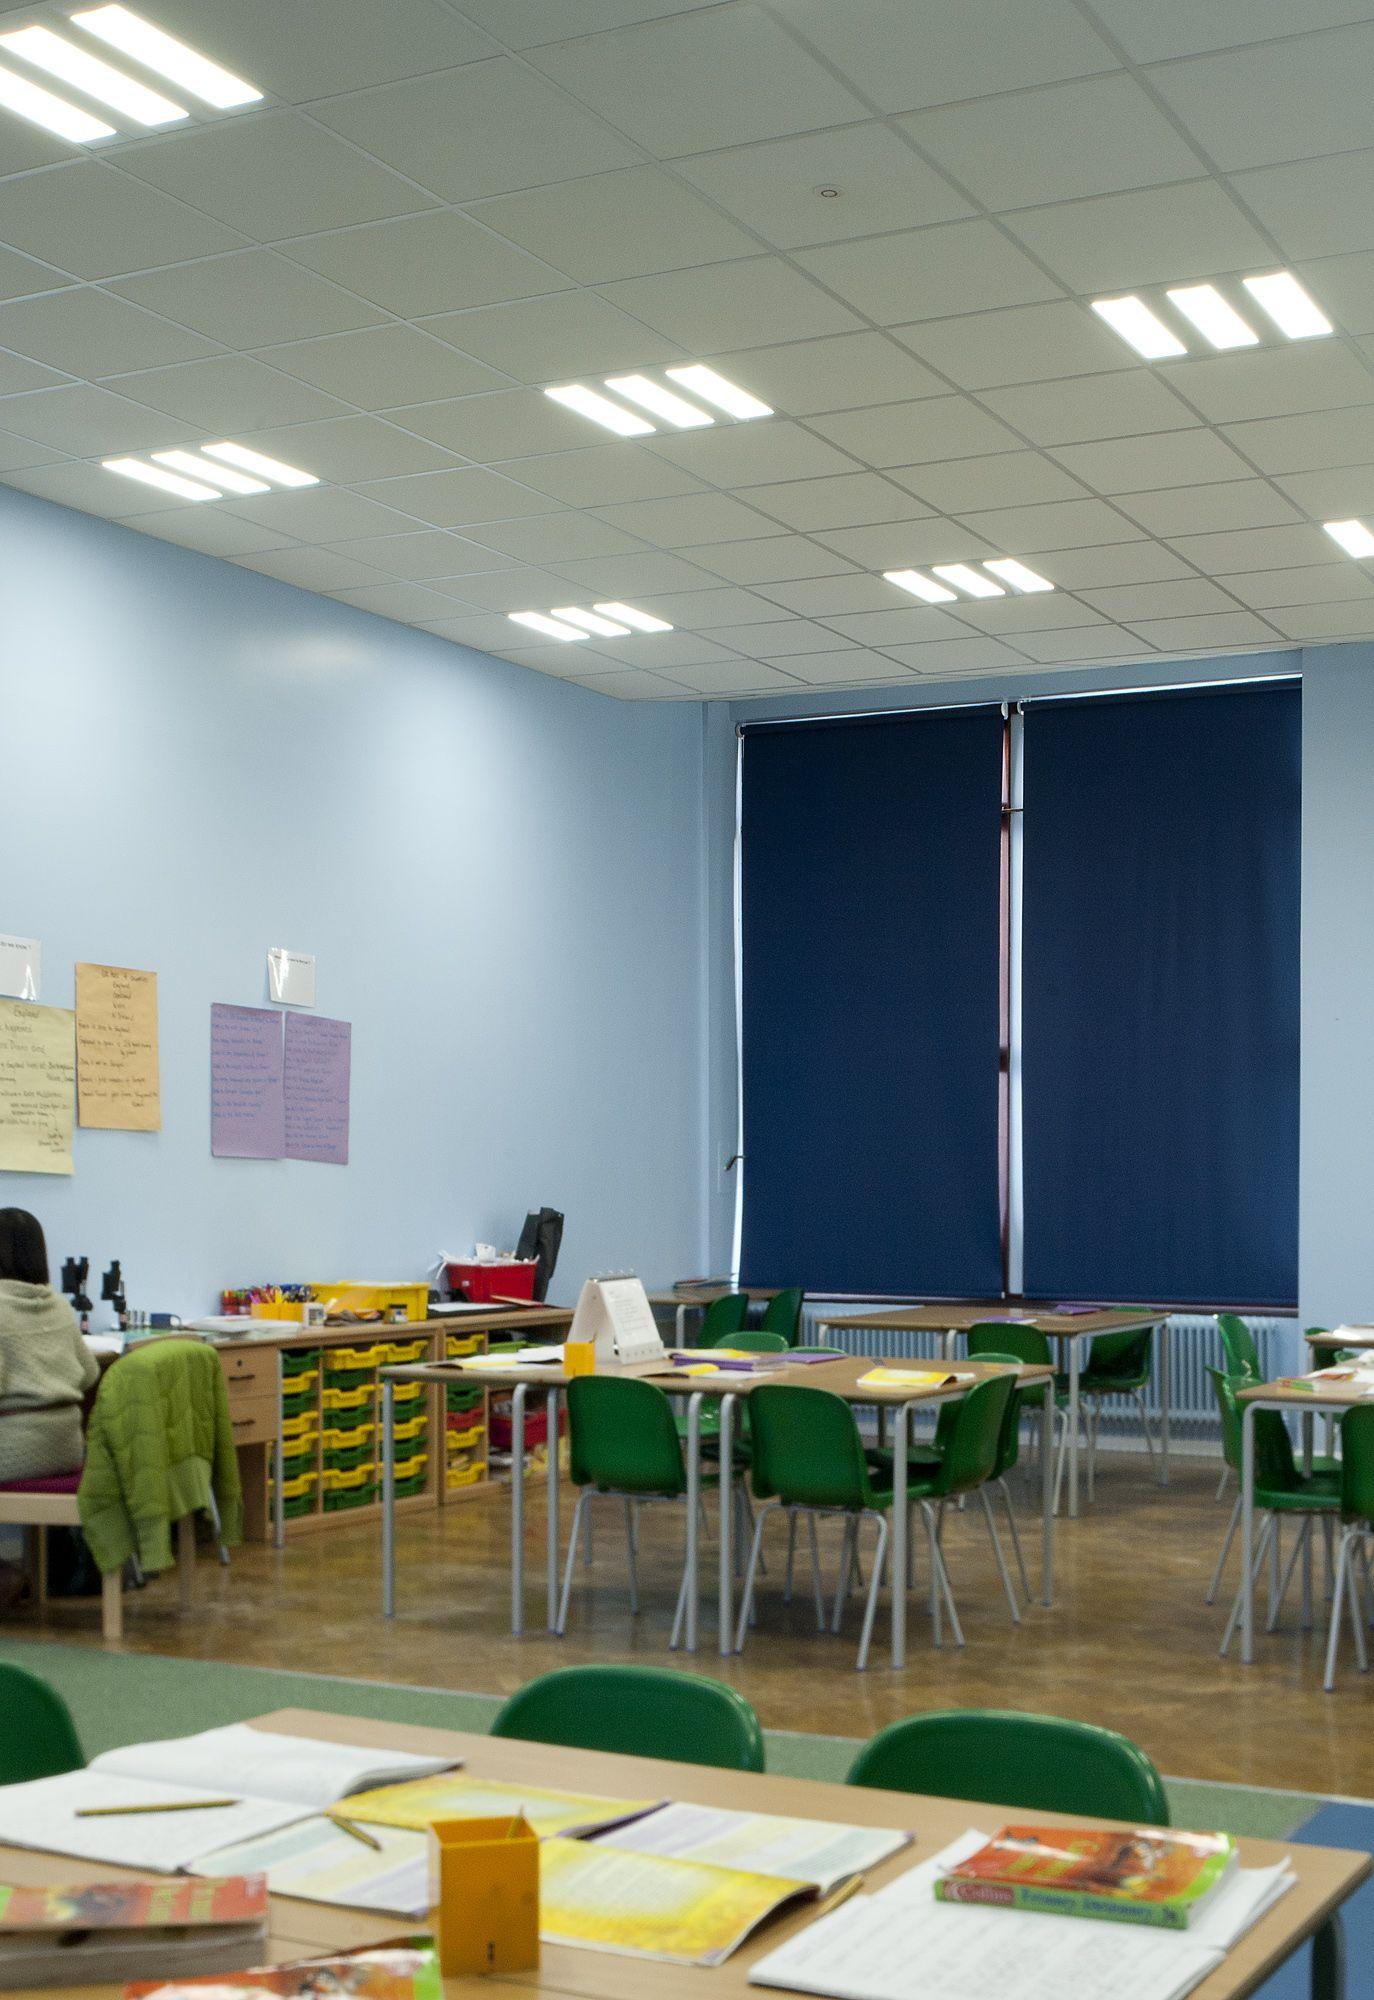 Junior School Classroom Lighting Using The Nova Led Ceiling Lighting Panels From Exled